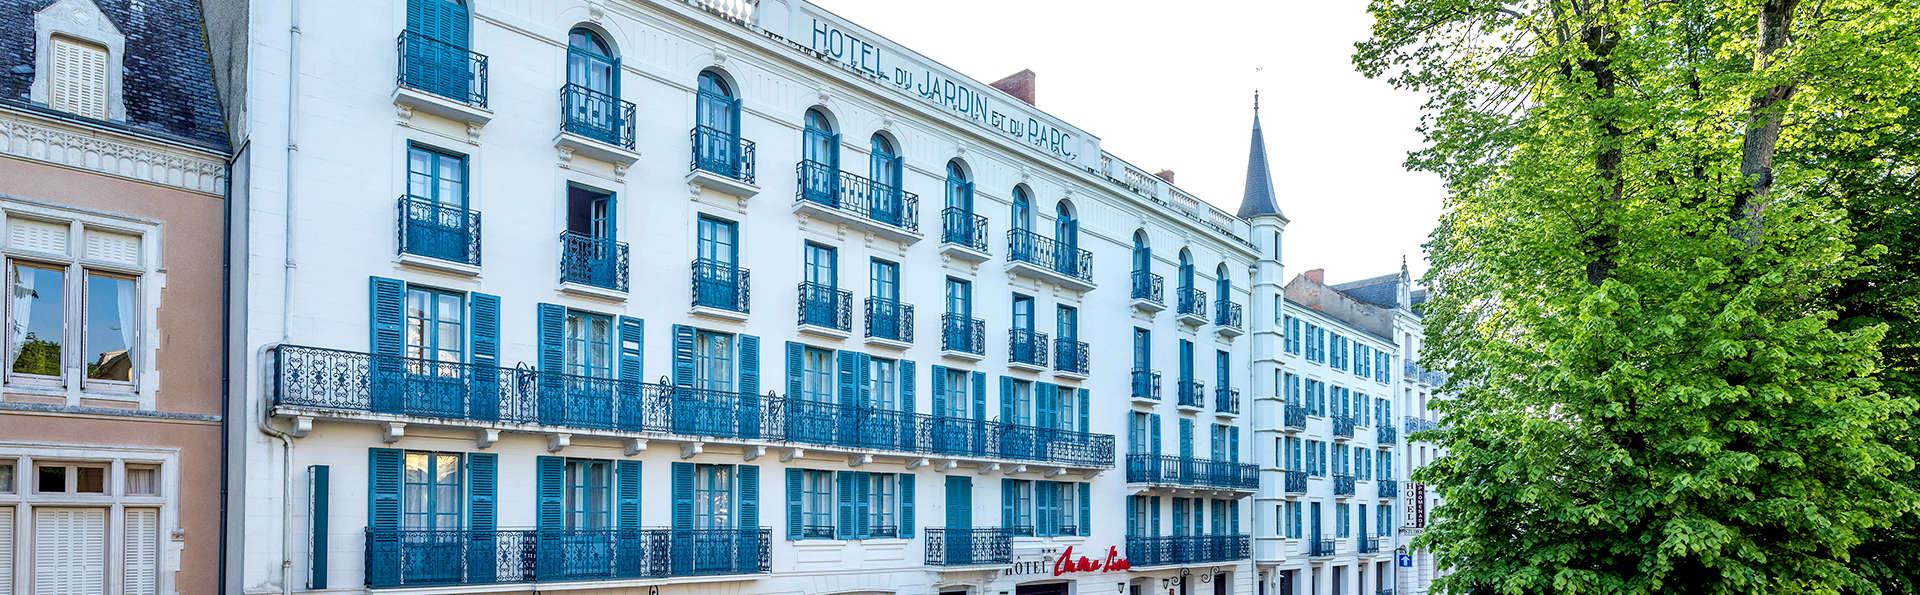 Hôtel Mona Lisa - Néris les bains - Edit_Front4.jpg